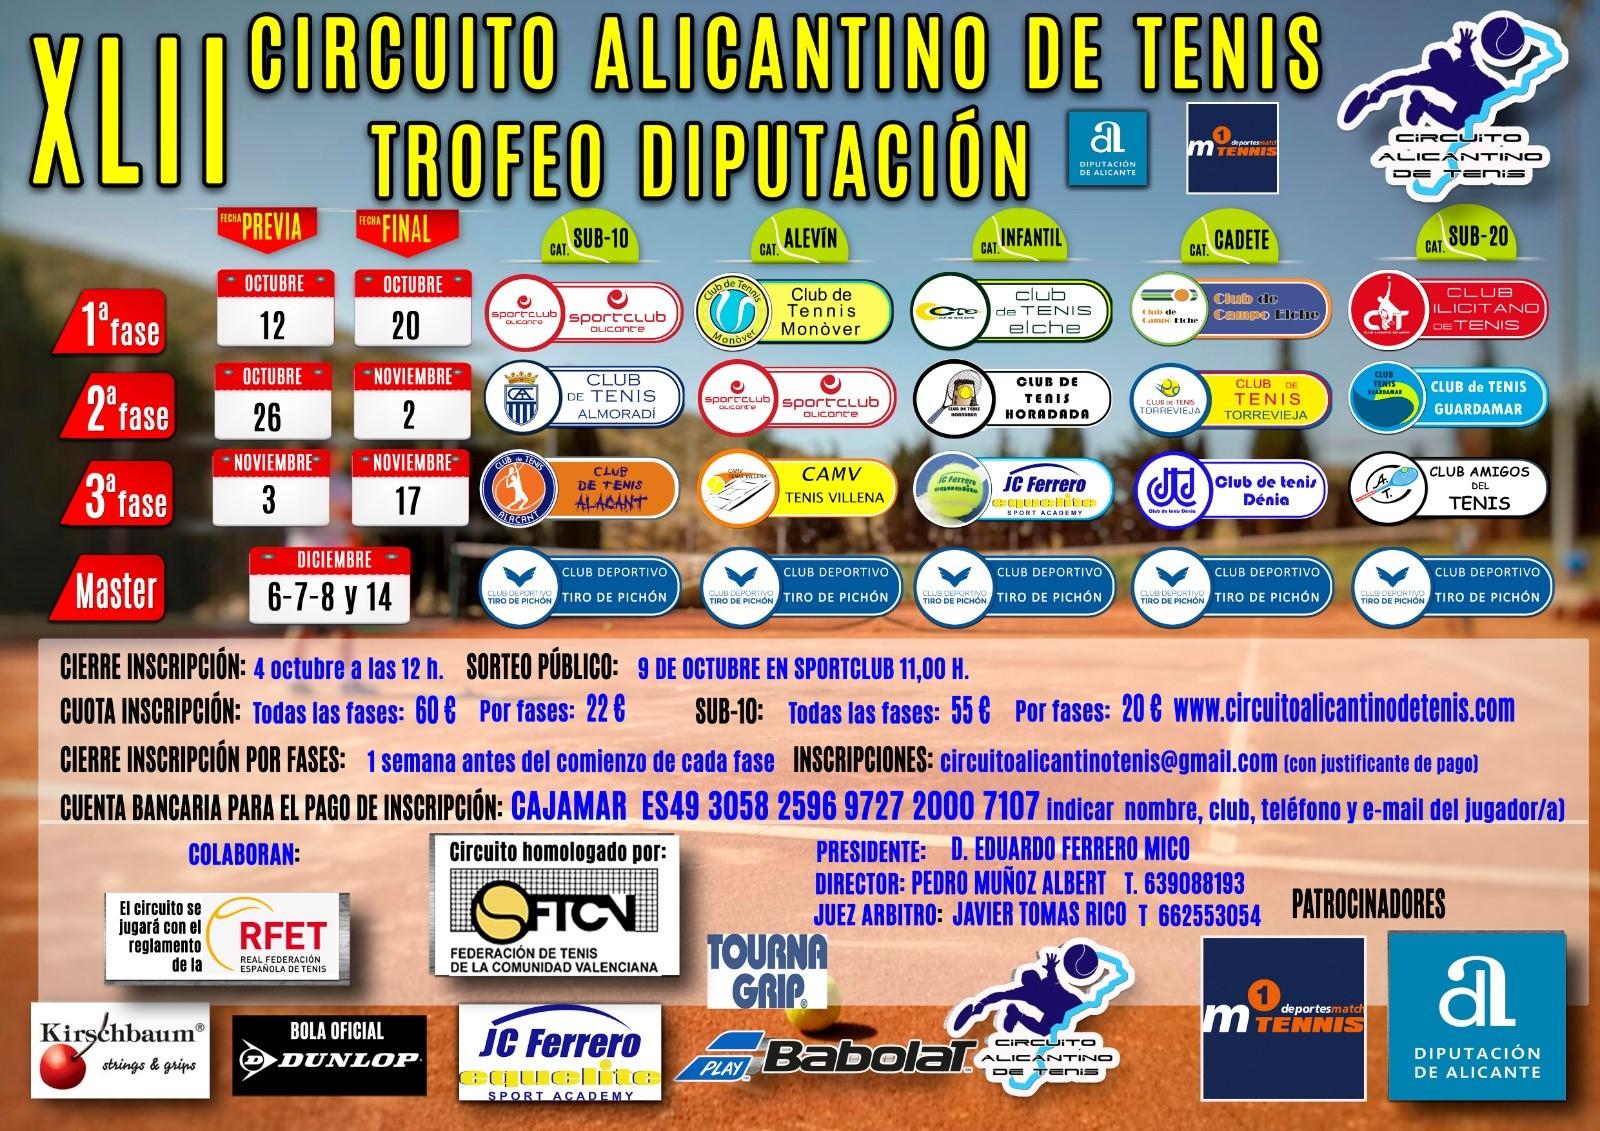 XLII Circuito Alicantino de tenis Trofeo Diputación